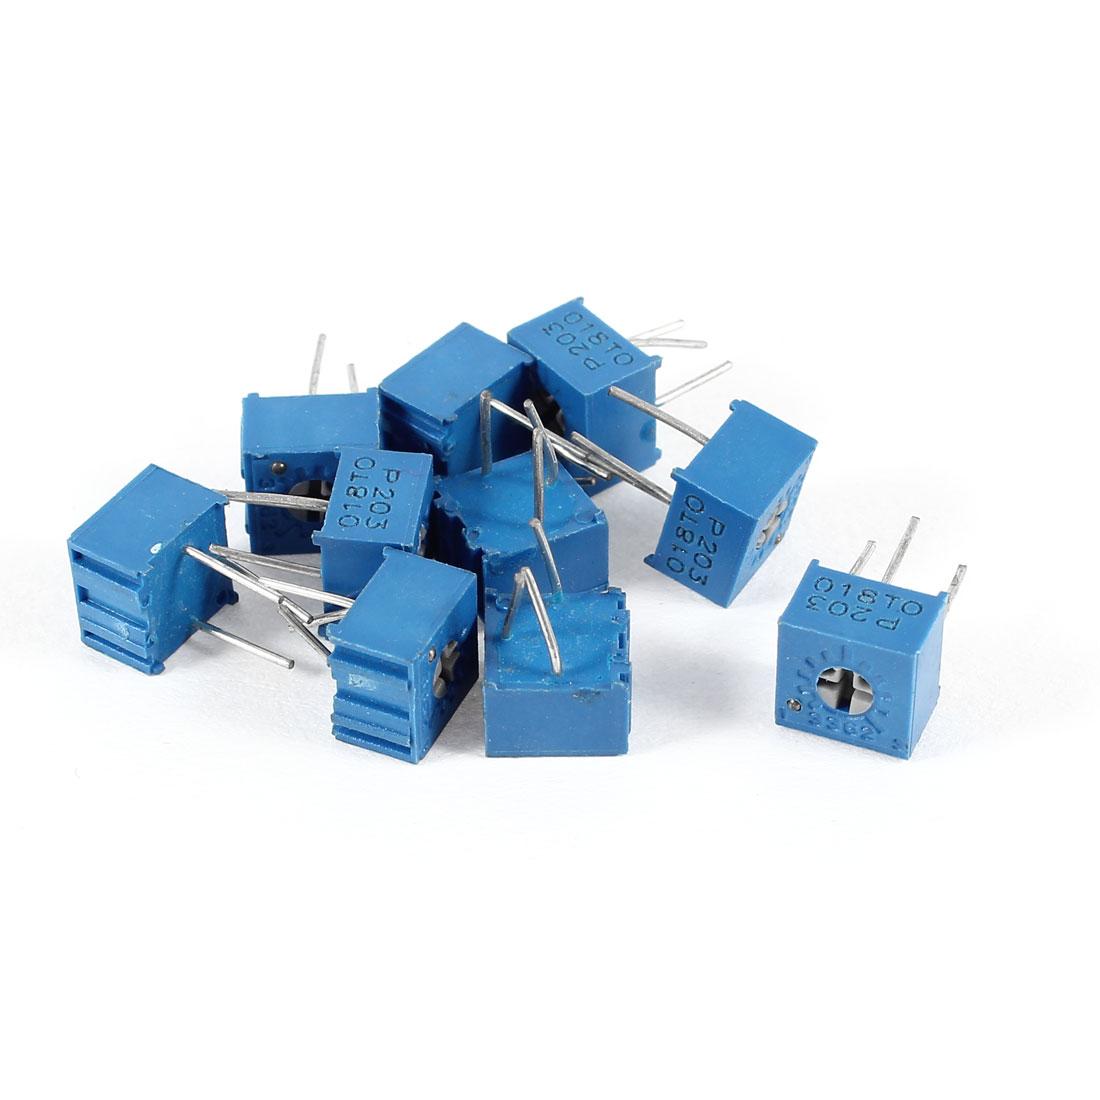 10 Pcs Potentiometer Trimmer Variable Resistor 3362P-203 20K Ohm